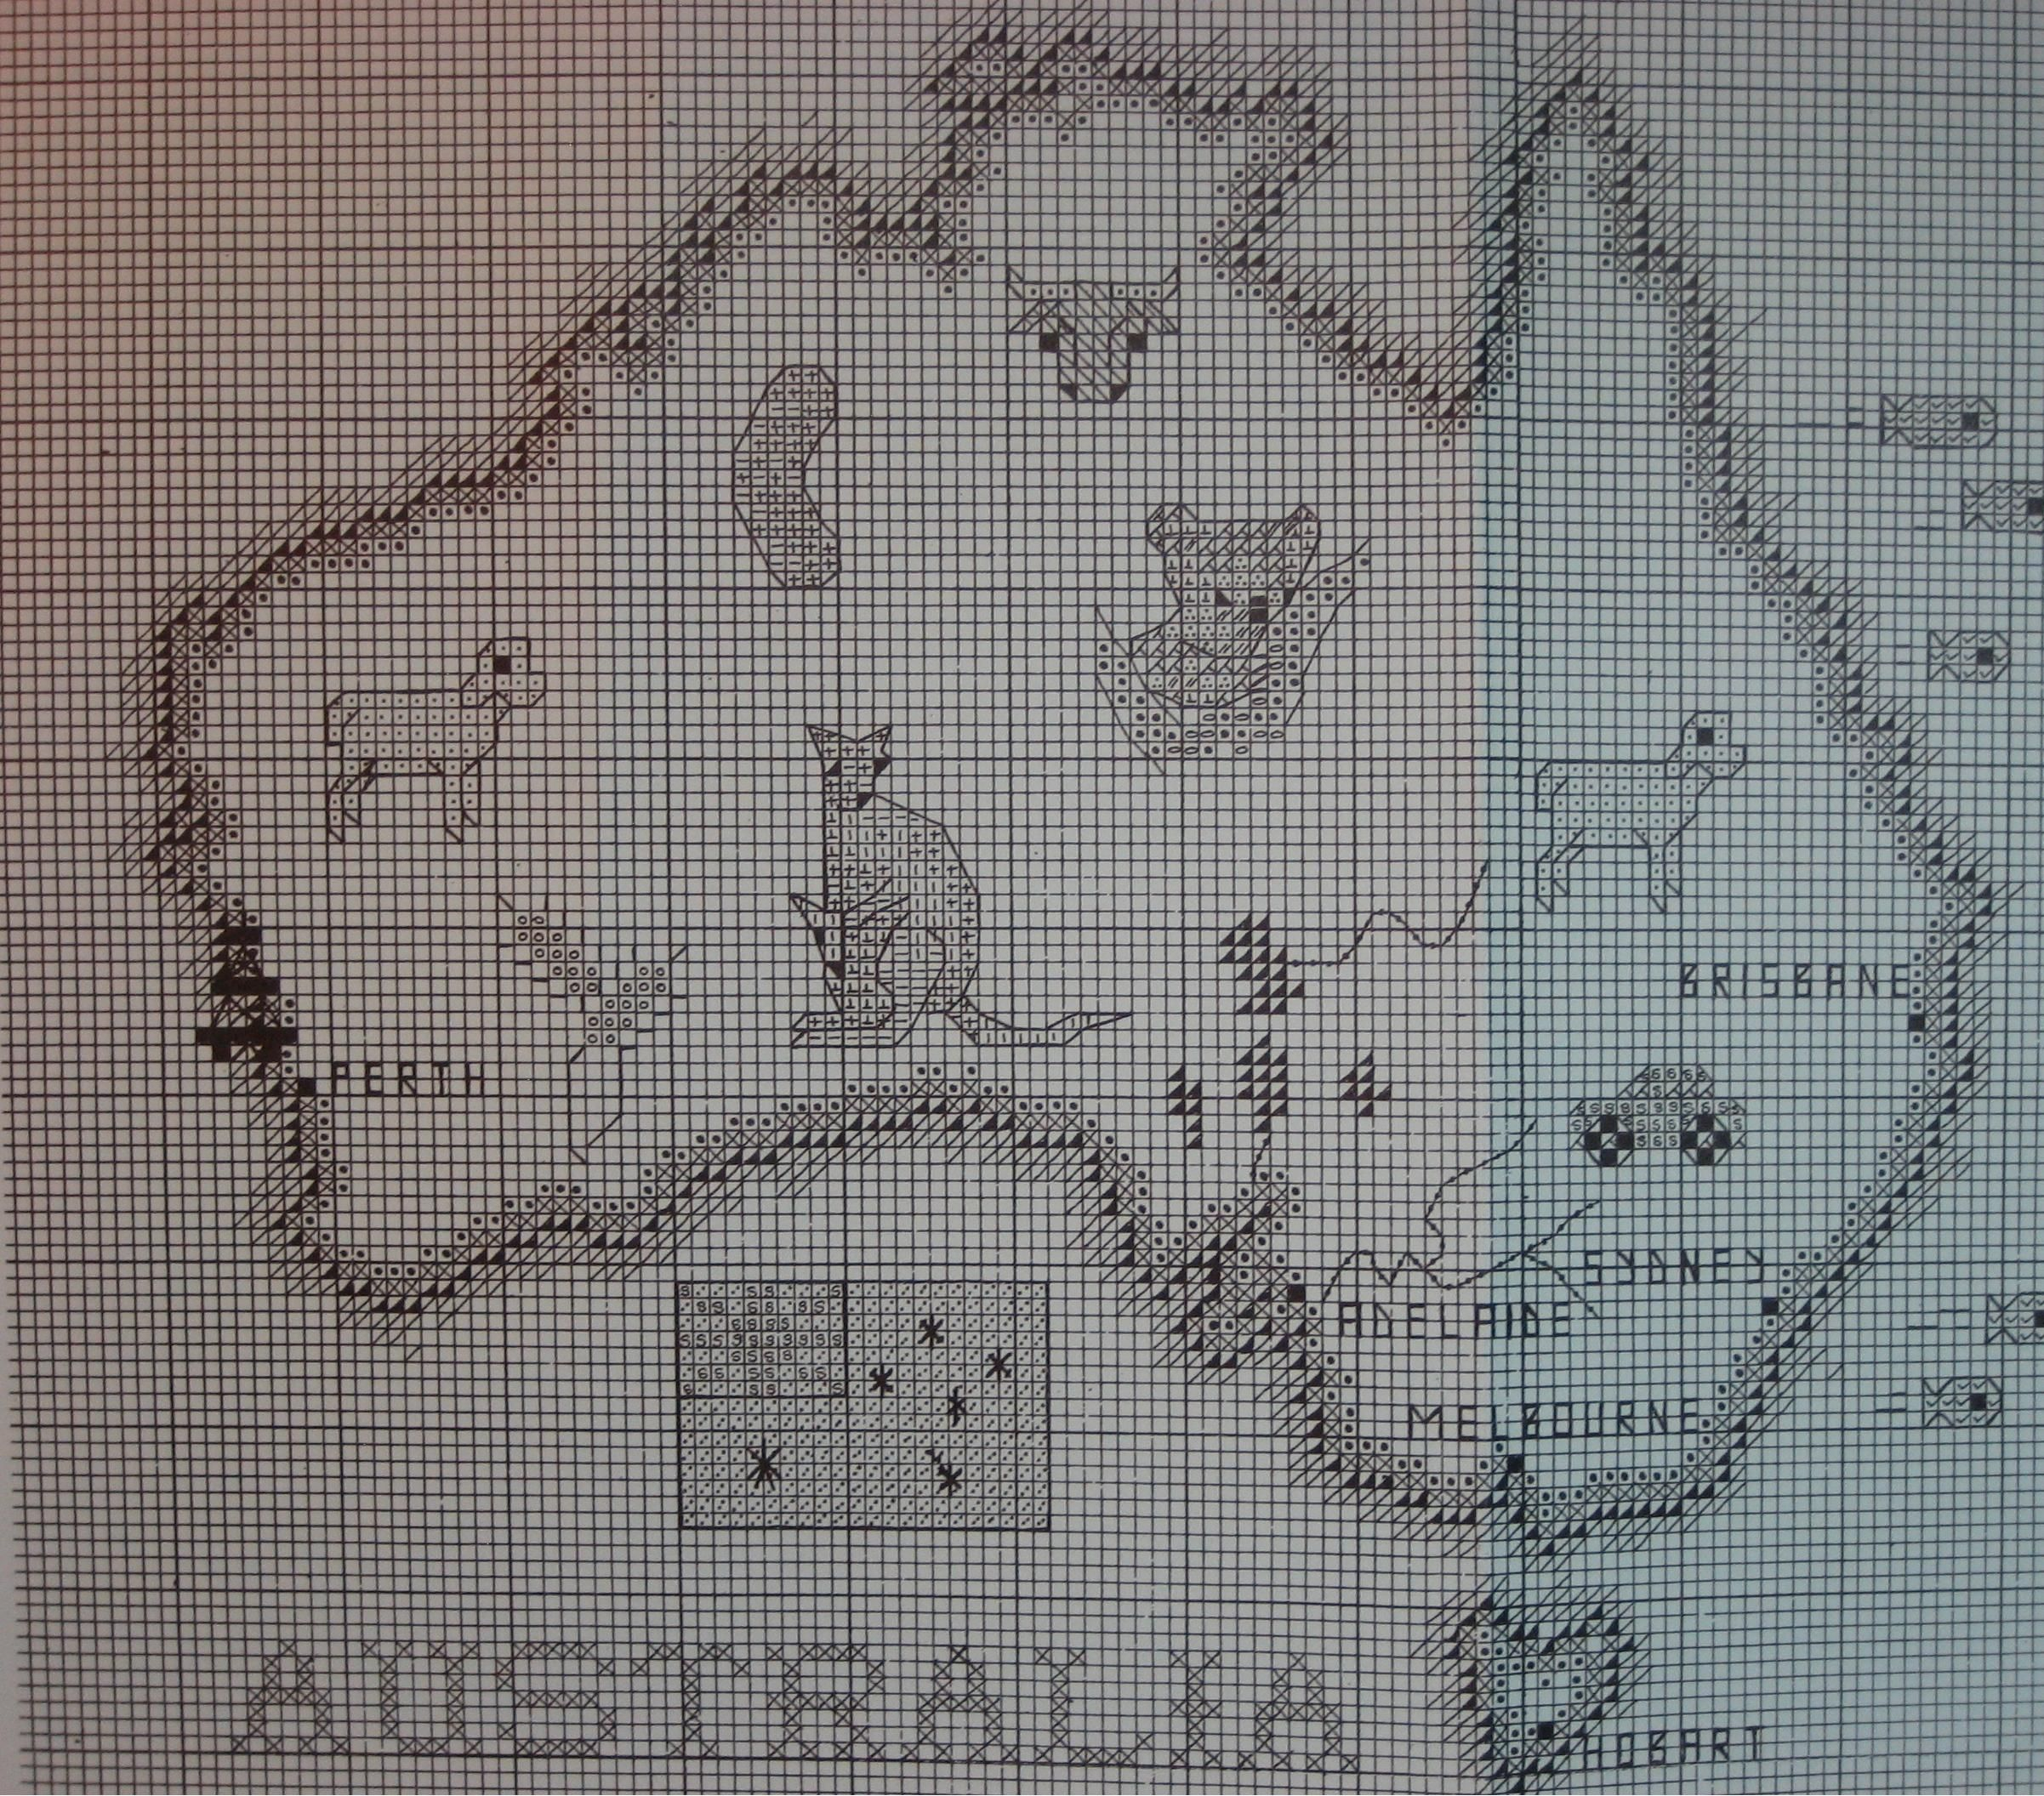 australian maps on counted cross stitch Australia Map 1